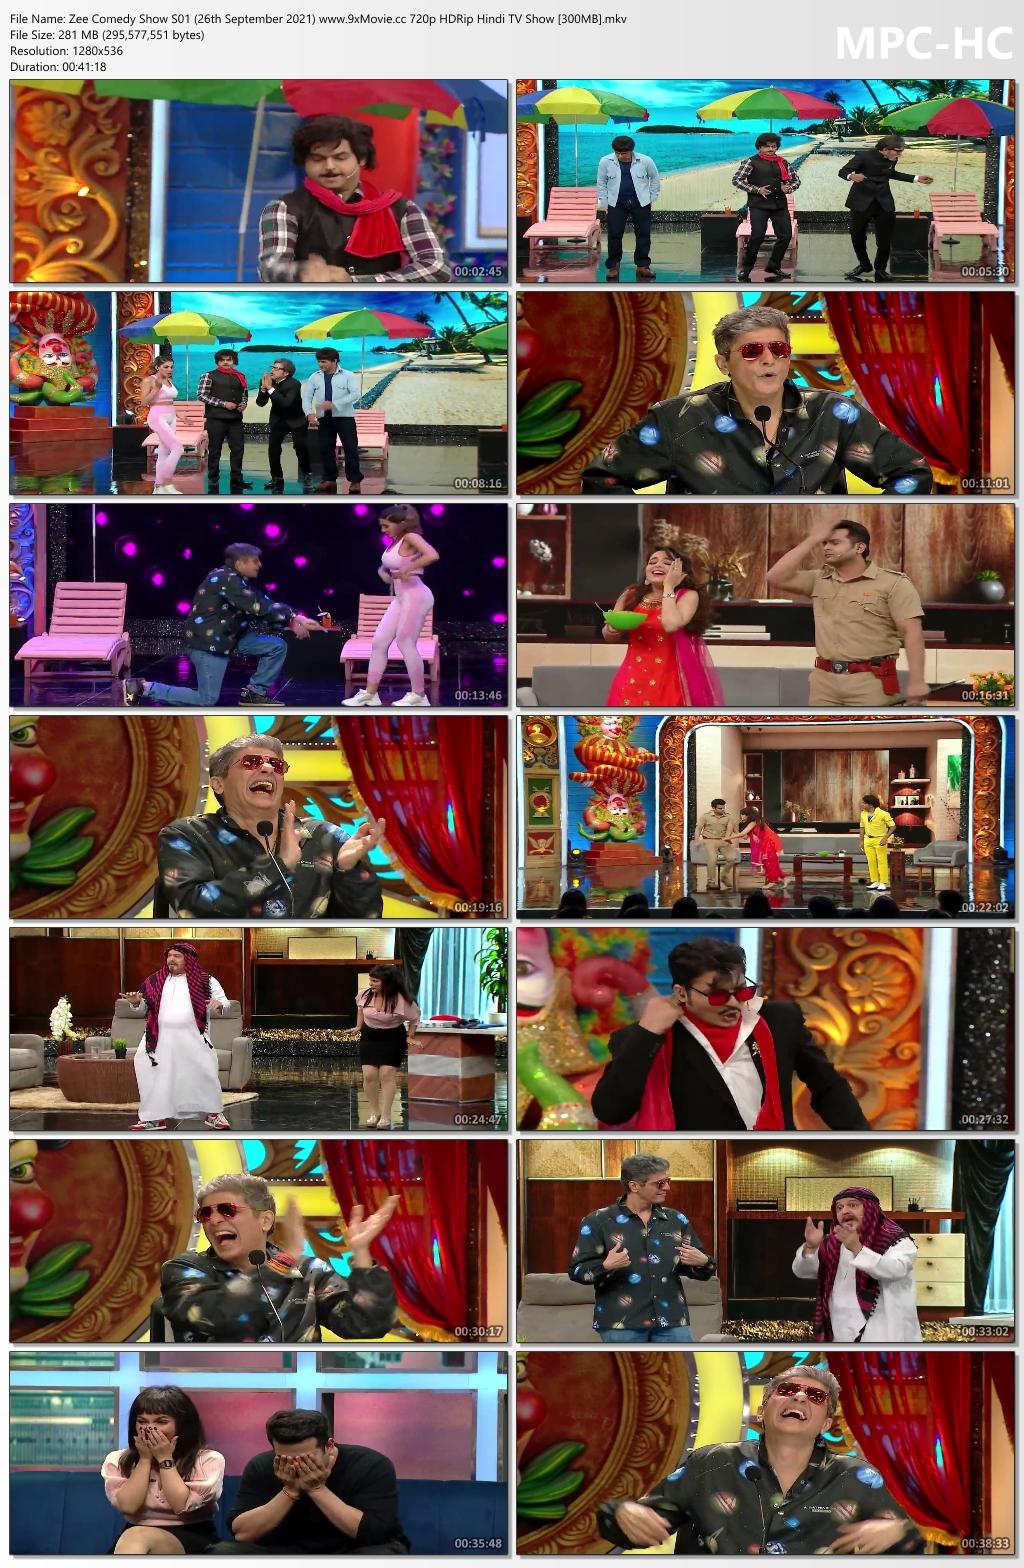 Zee-Comedy-Show-S01-26th-September-2021-www-9x-Movie-cc-720p-HDRip-Hindi-TV-Show-300-MB-mkv